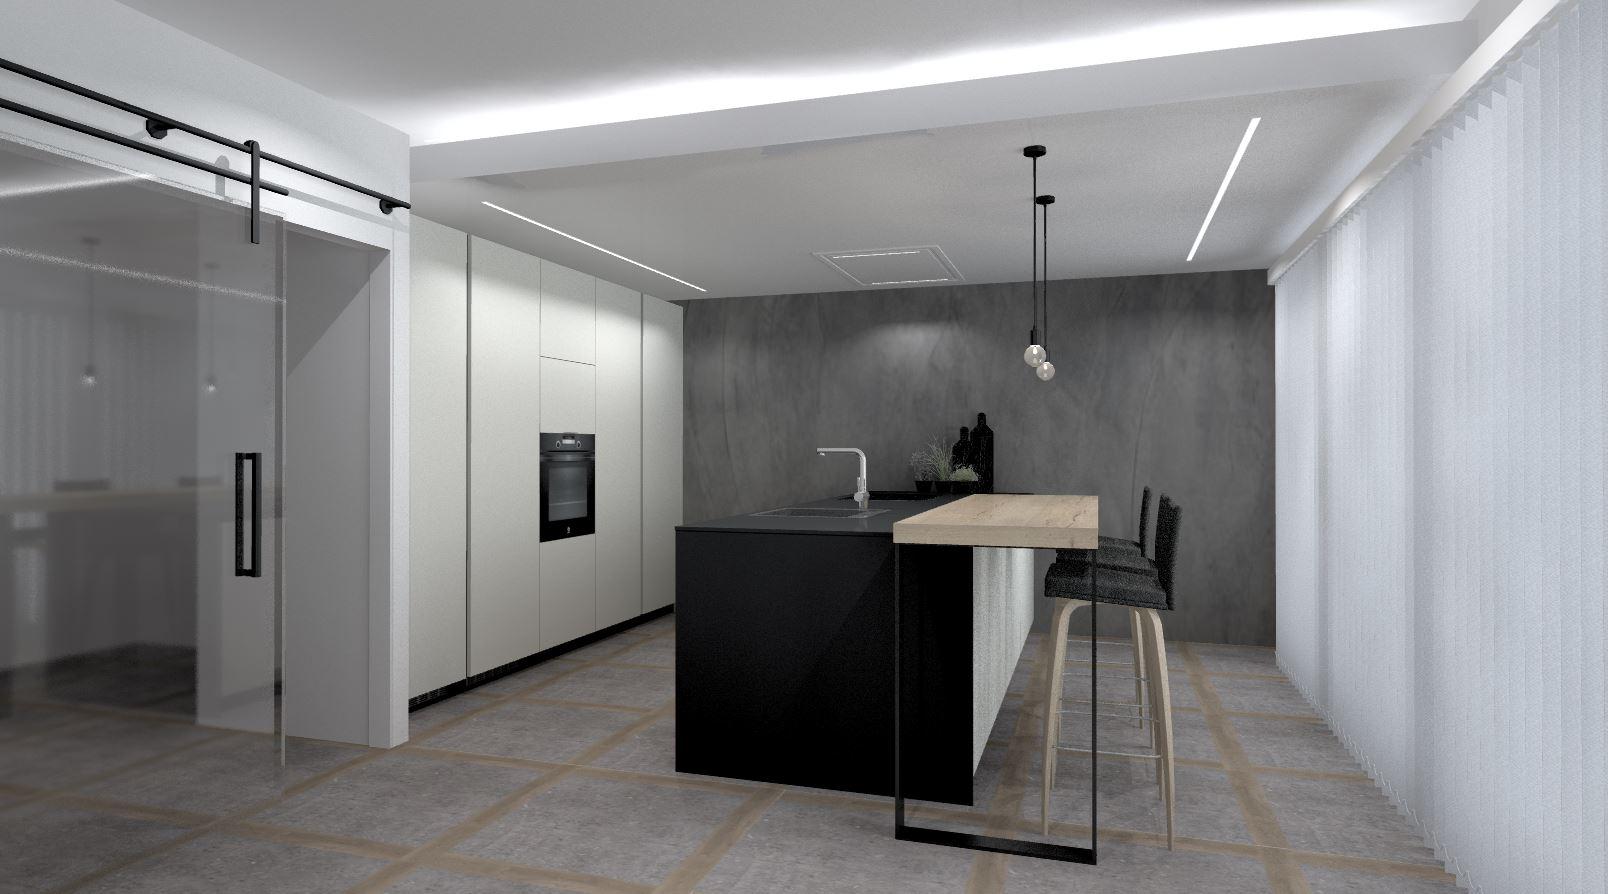 Cocina negra con suelo de madera Santos